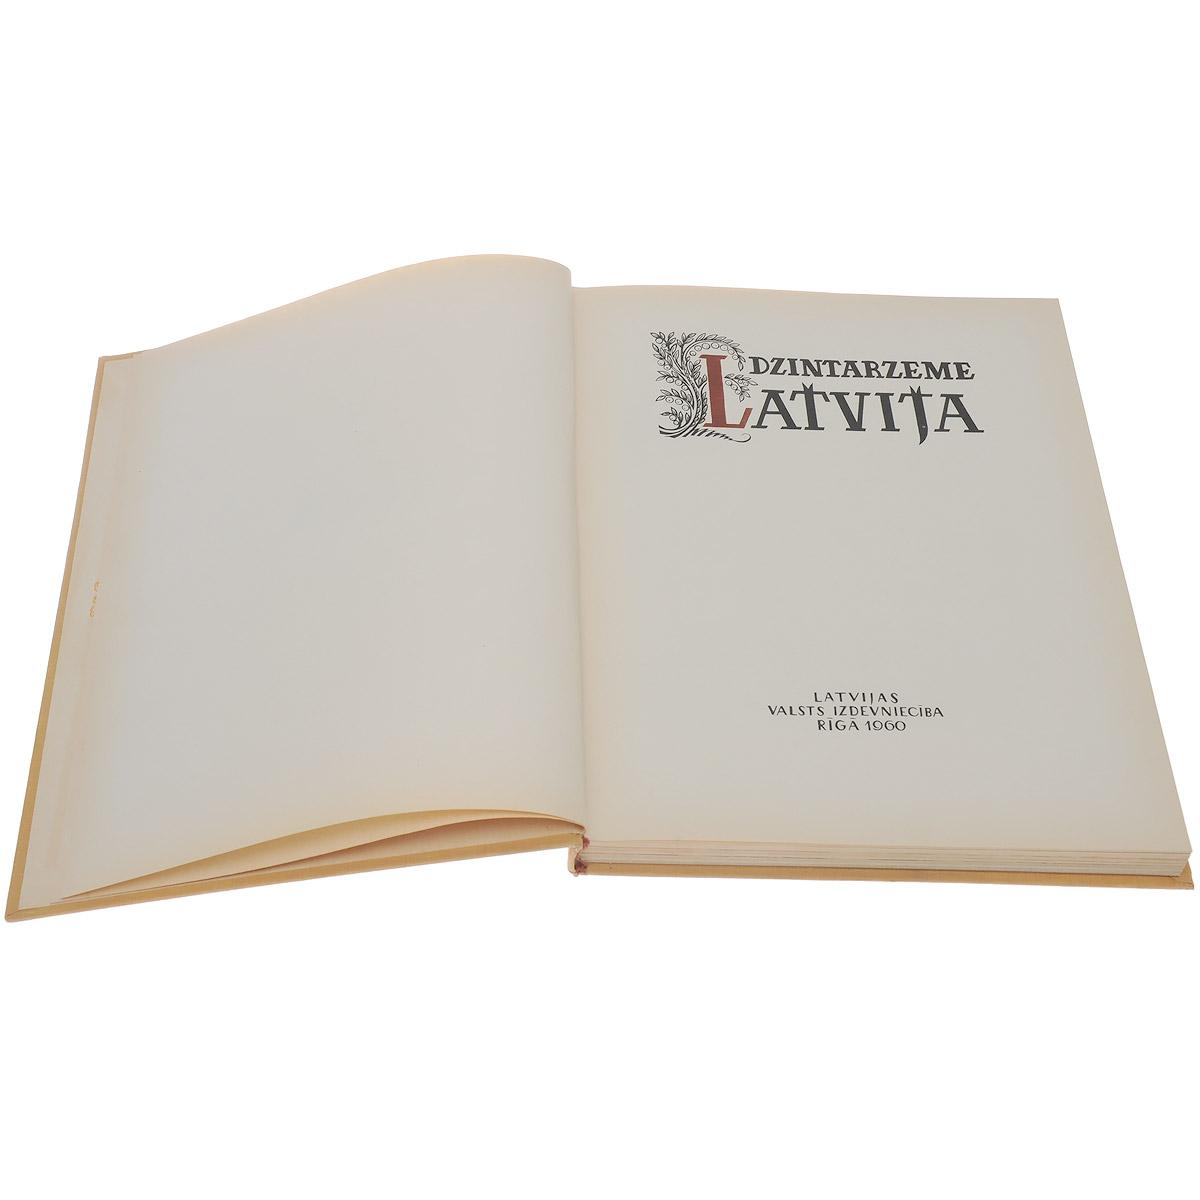 Dzintarzeme Latvija